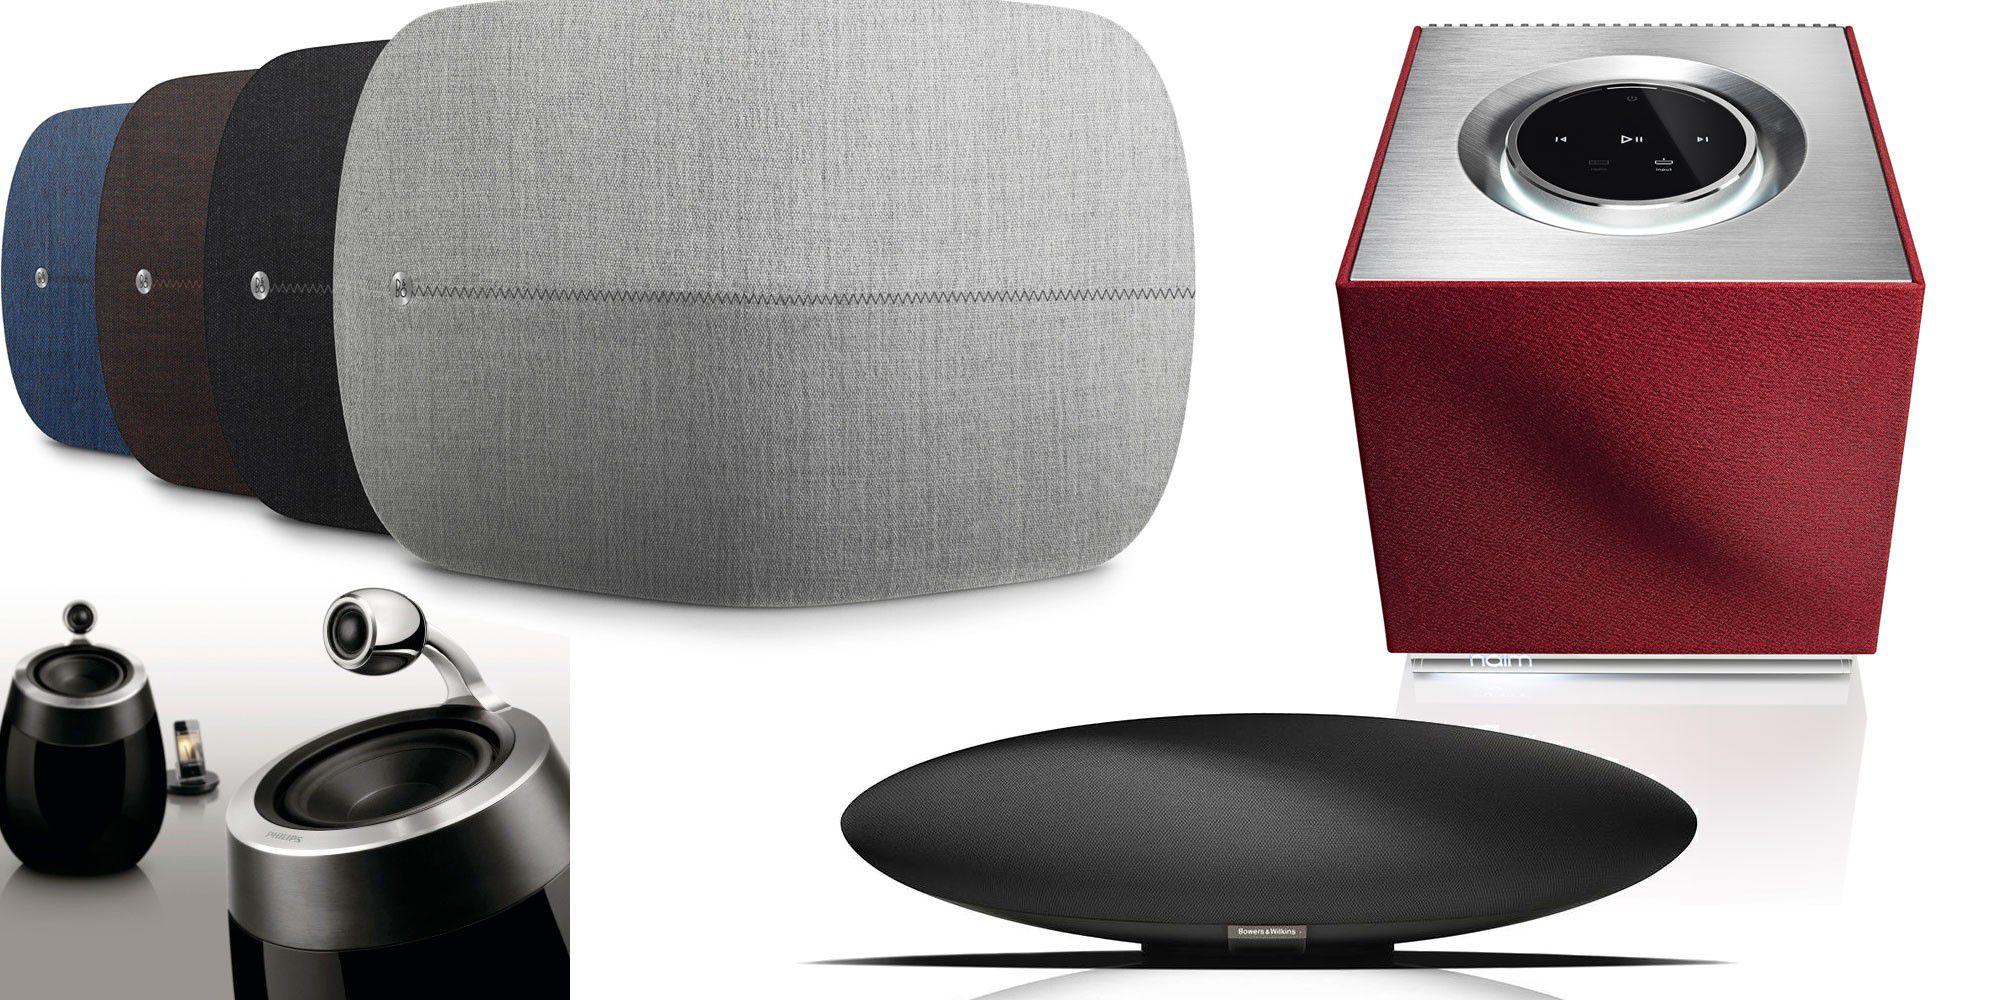 gro er test airplay lautsprecher macwelt. Black Bedroom Furniture Sets. Home Design Ideas